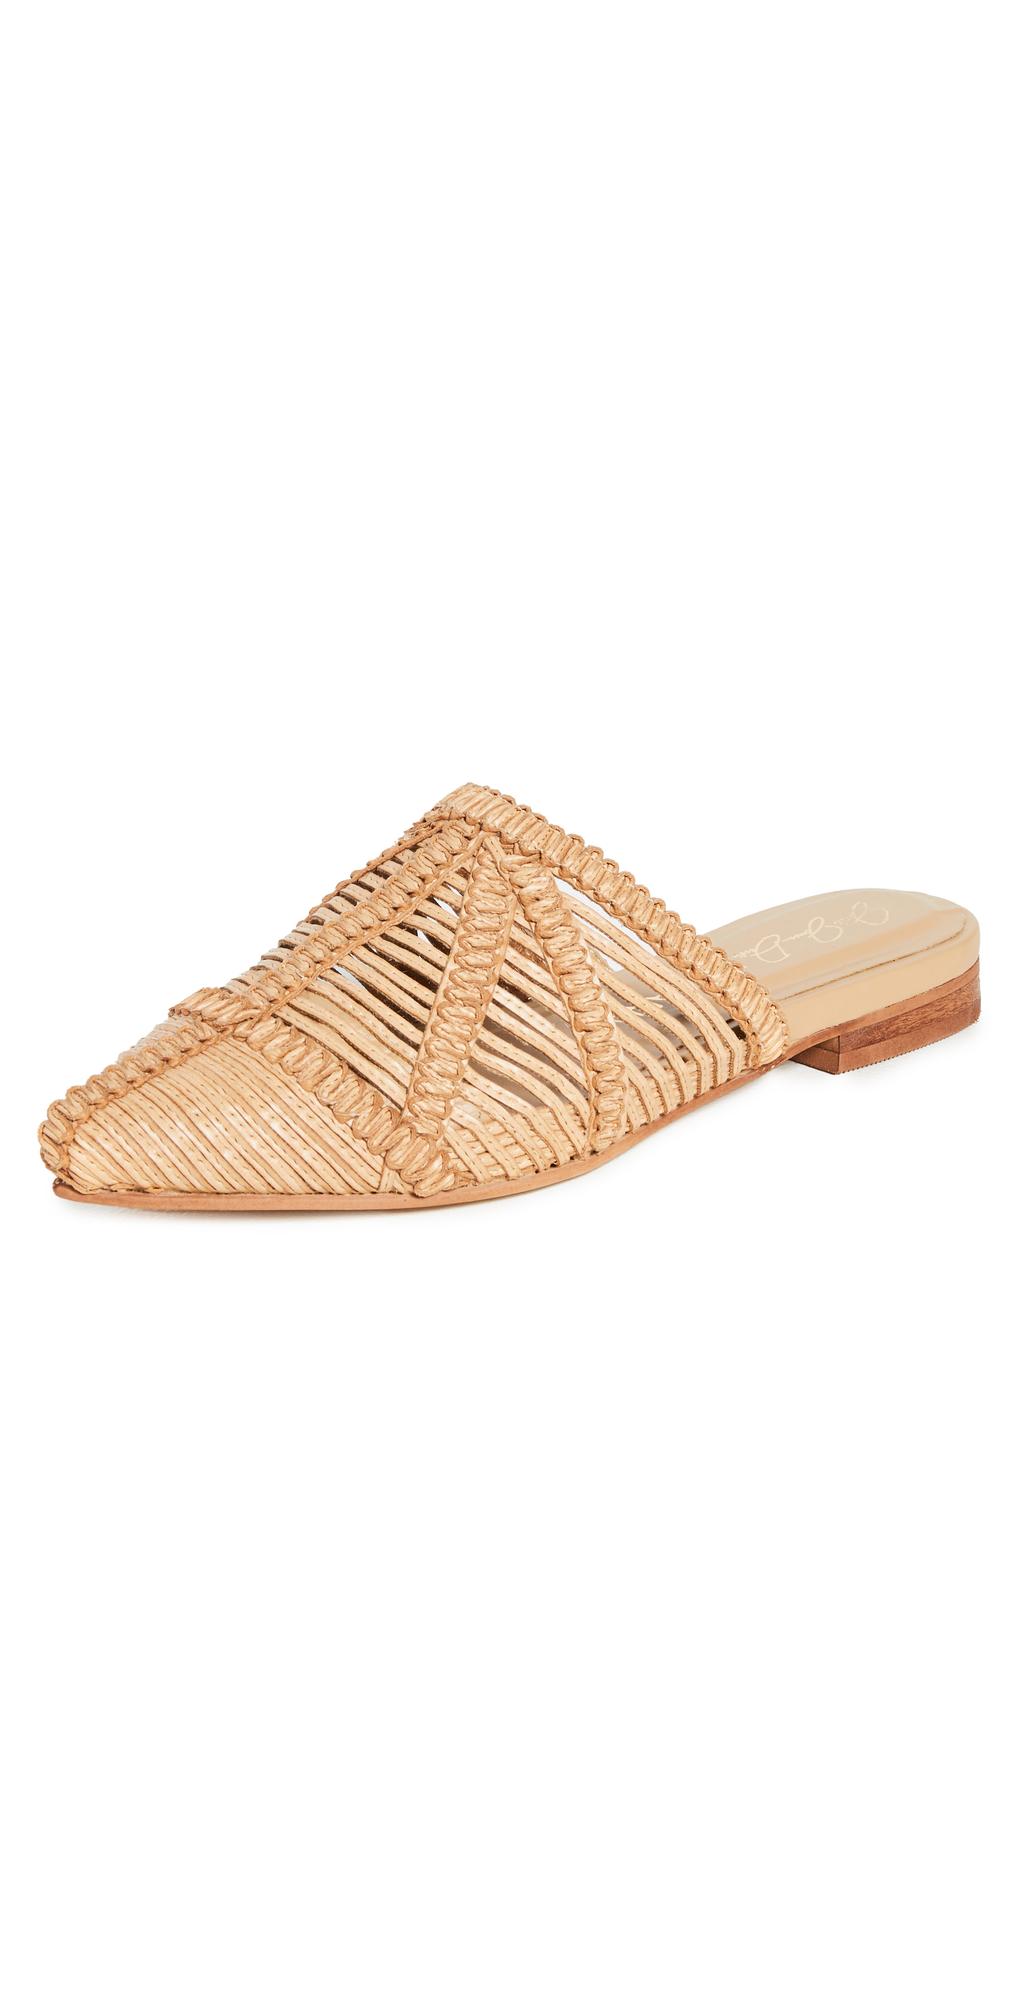 Madeira Basketweave Mules